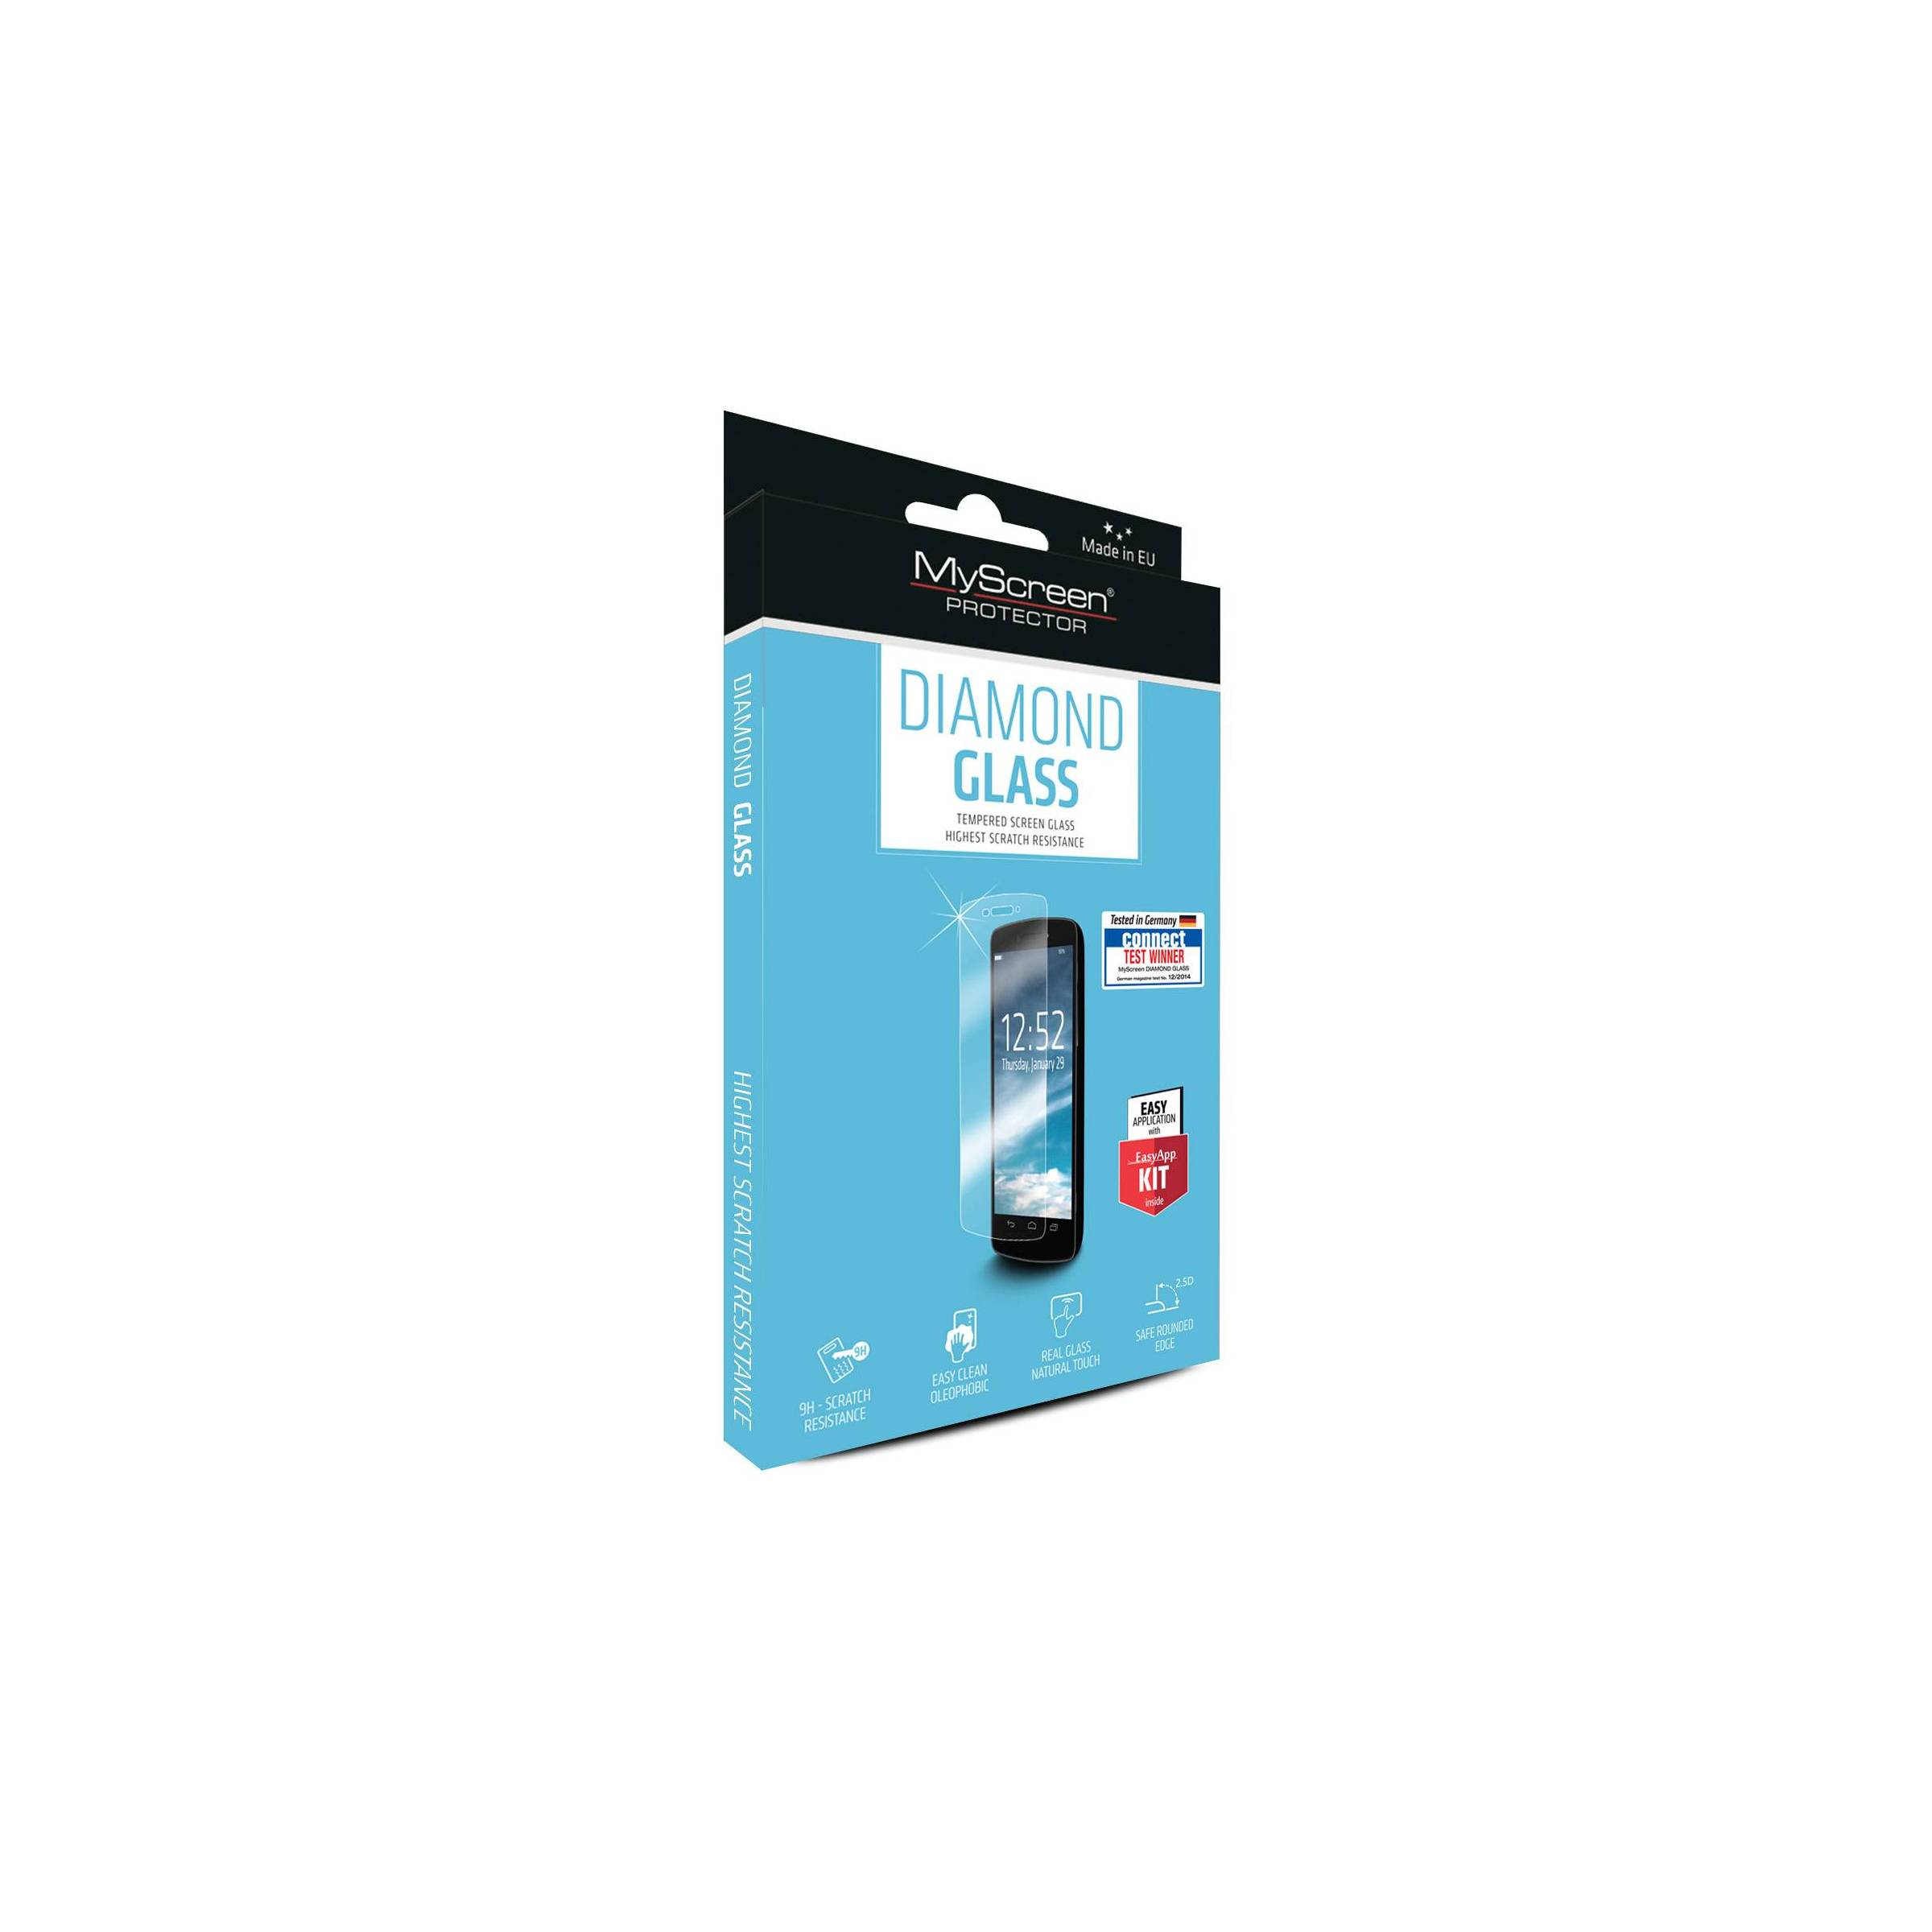 myscreen Myscreen diamond iphone 6/6s plus beskyttelsesglas på mackabler.dk